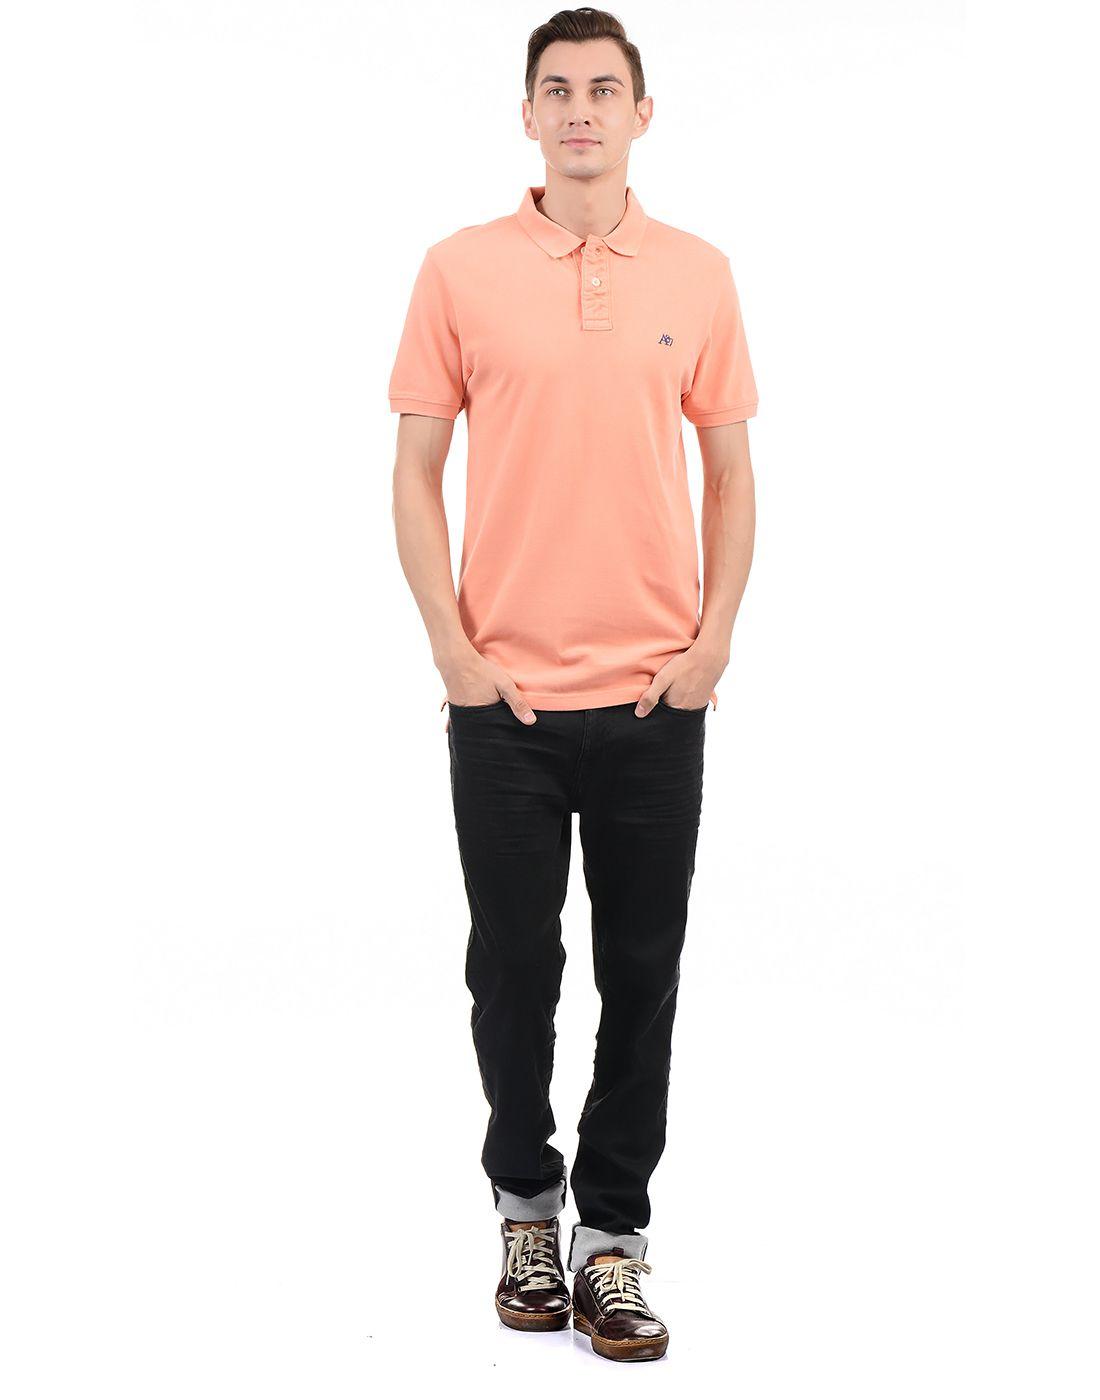 1b449feae Aeropostale Orange Regular Fit Polo T Shirt - Buy Aeropostale Orange ...